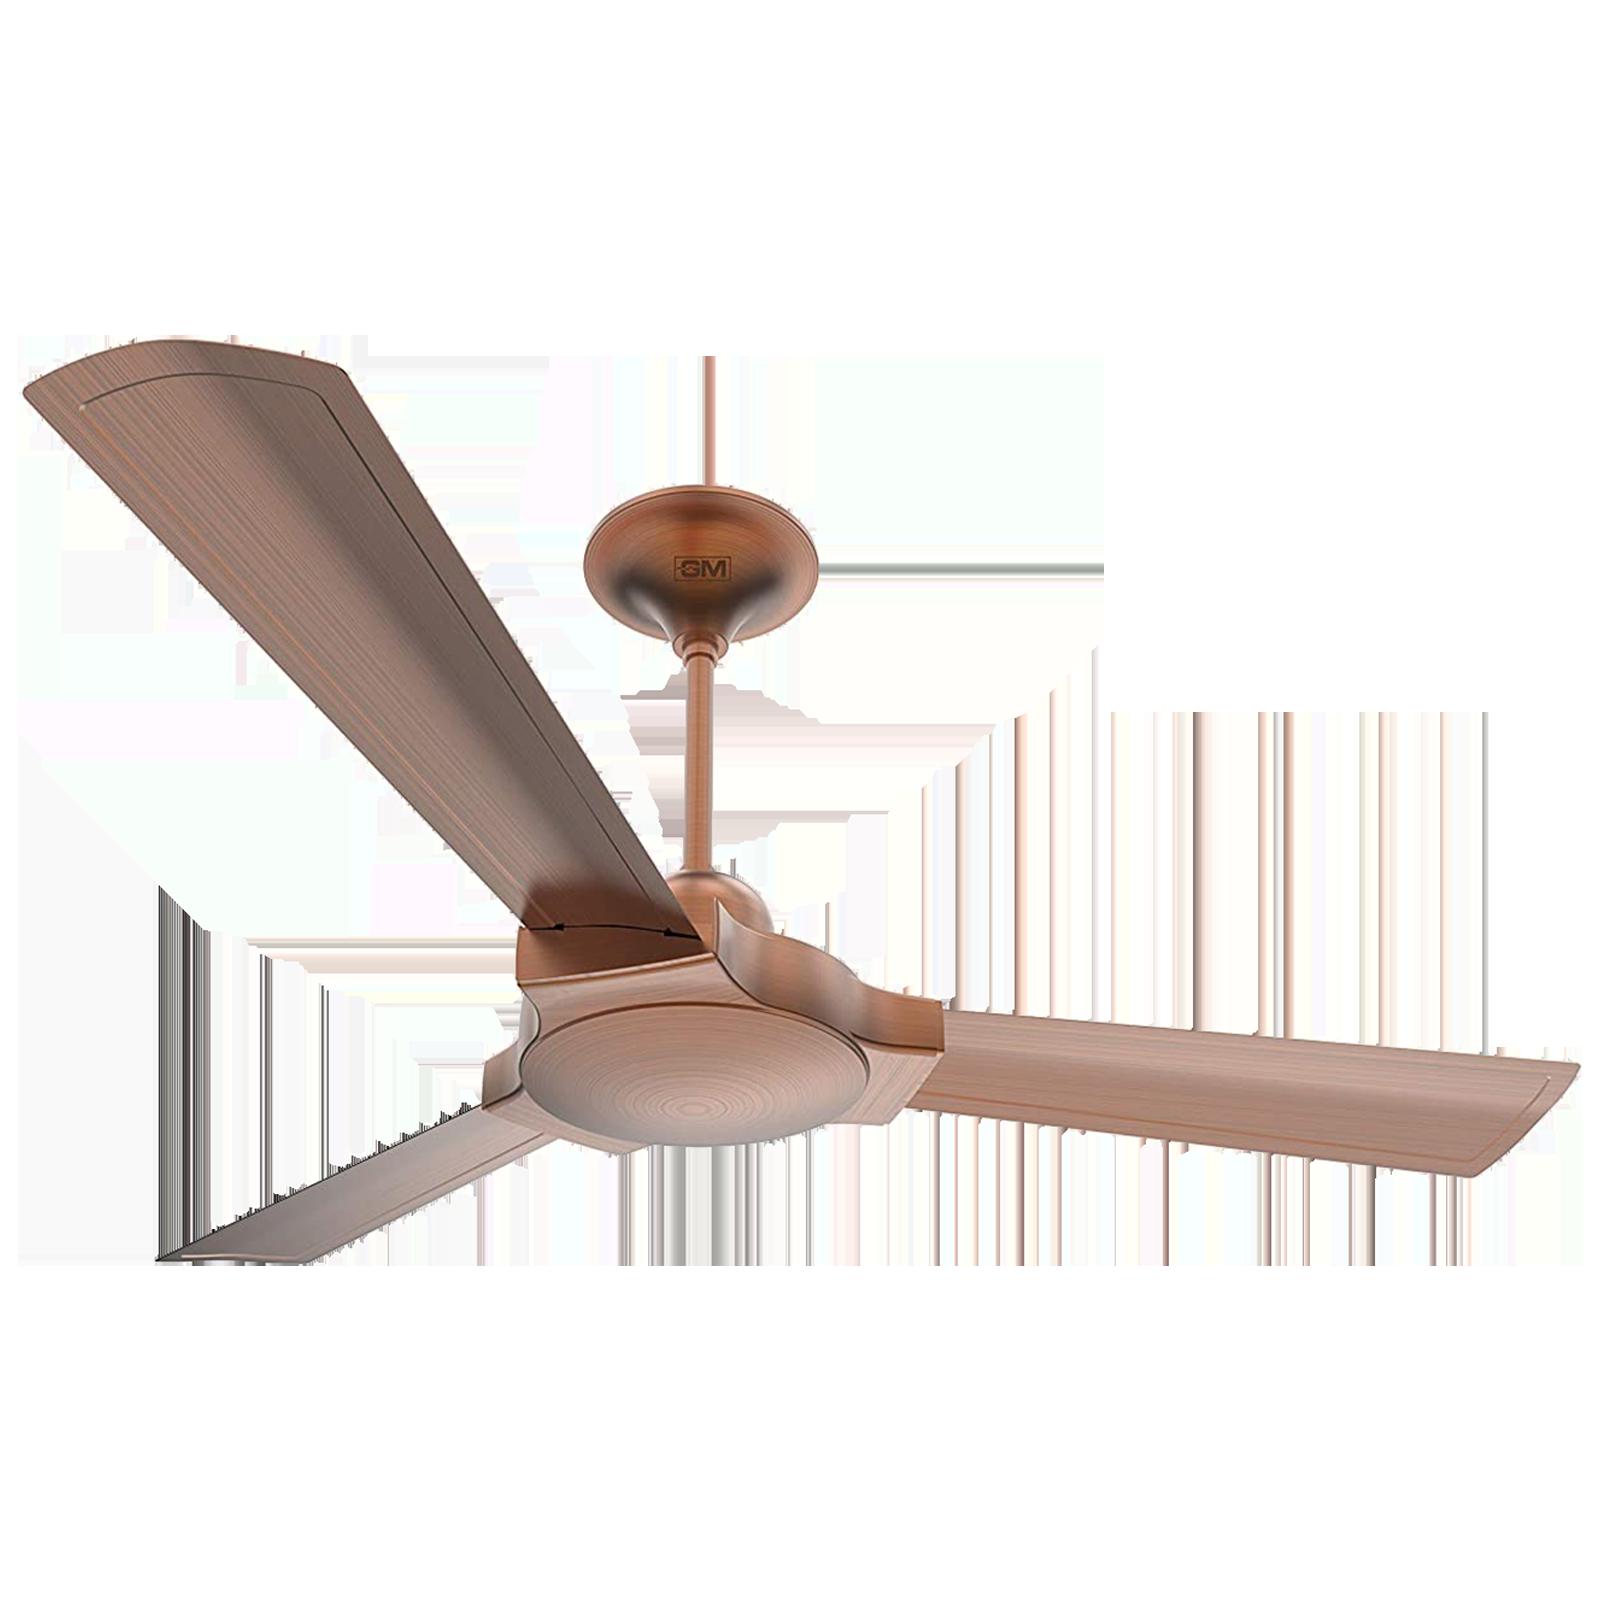 GM Lustre 120 cm Sweep 3 Blade Ceiling Fan (Extra Copper, CFP480013CUEP, Bronze)_1